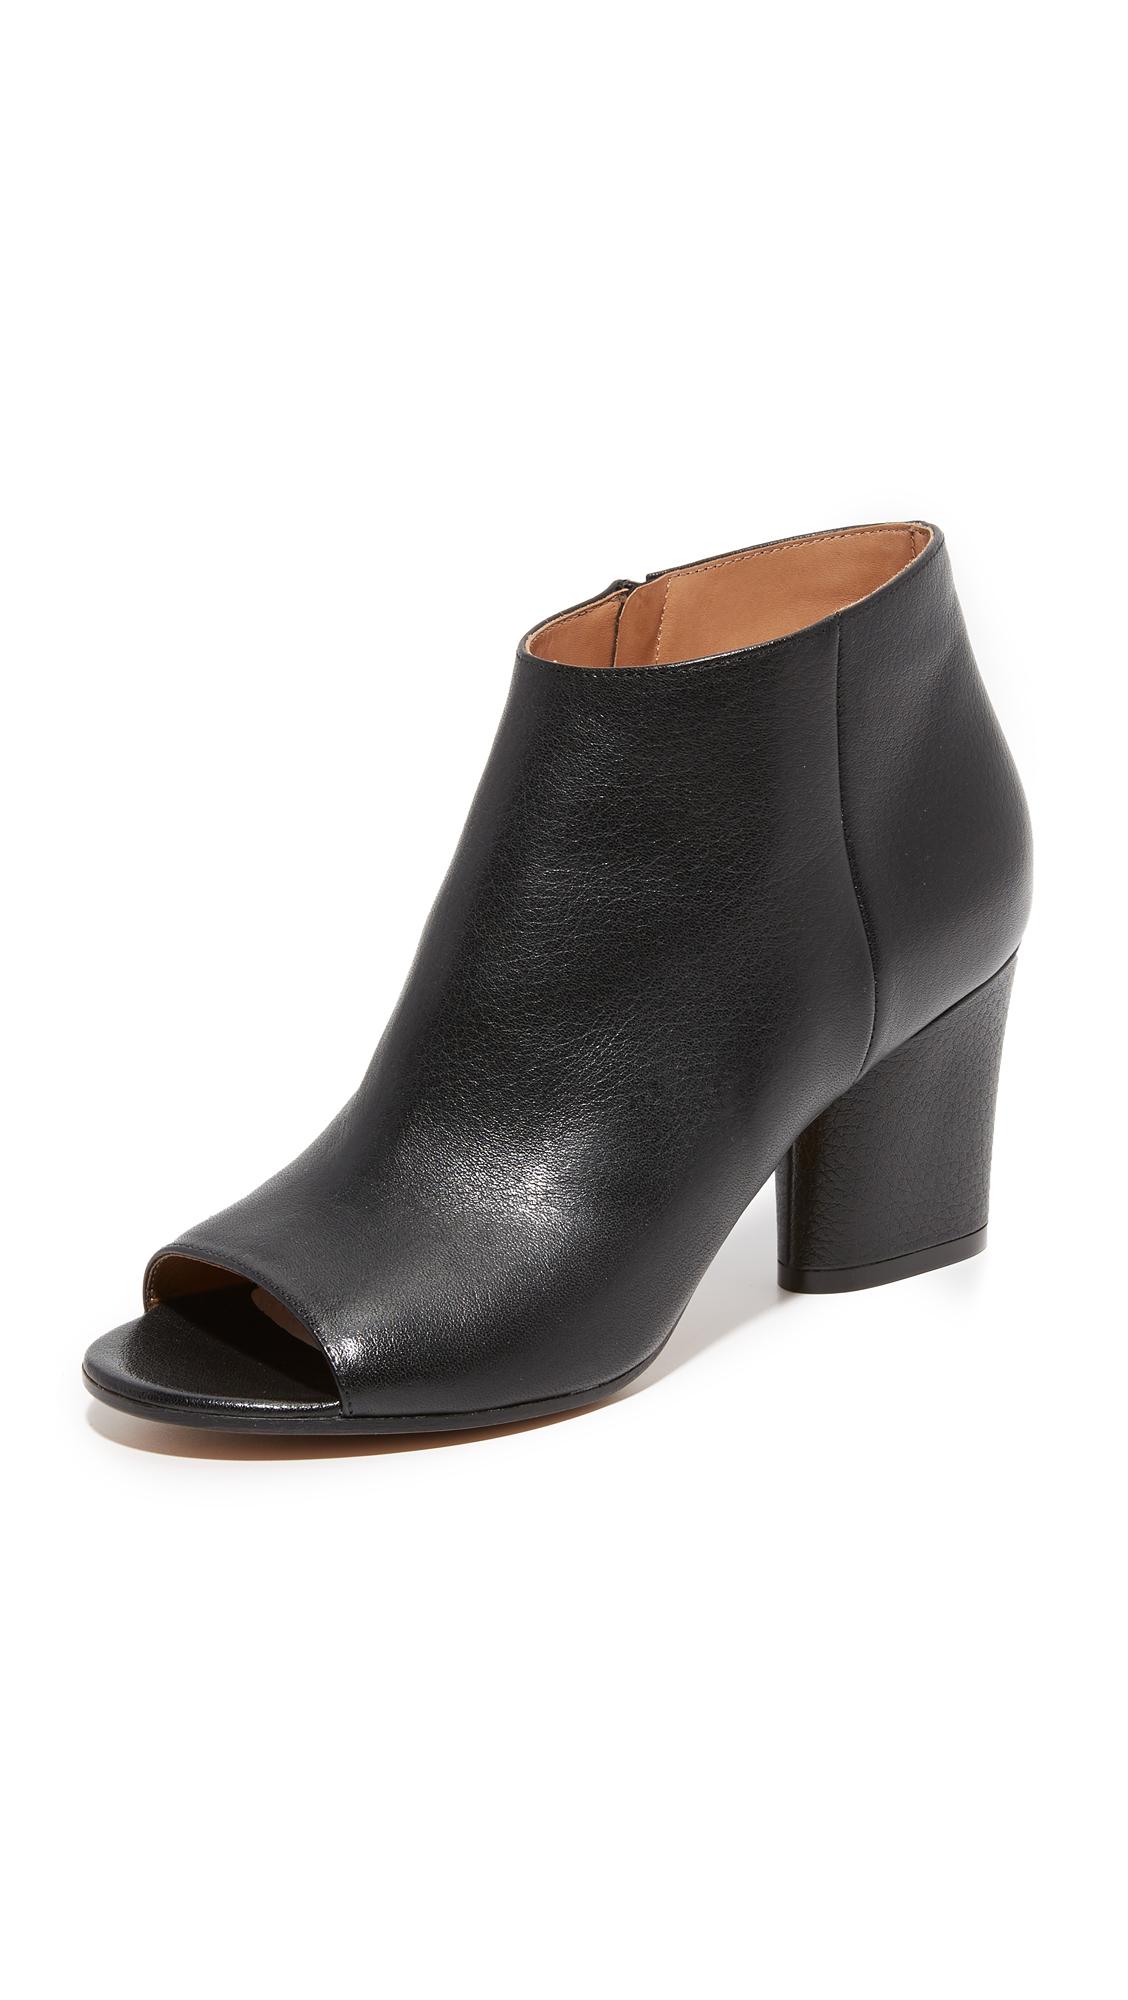 Maison Margiela Leather Booties - Black